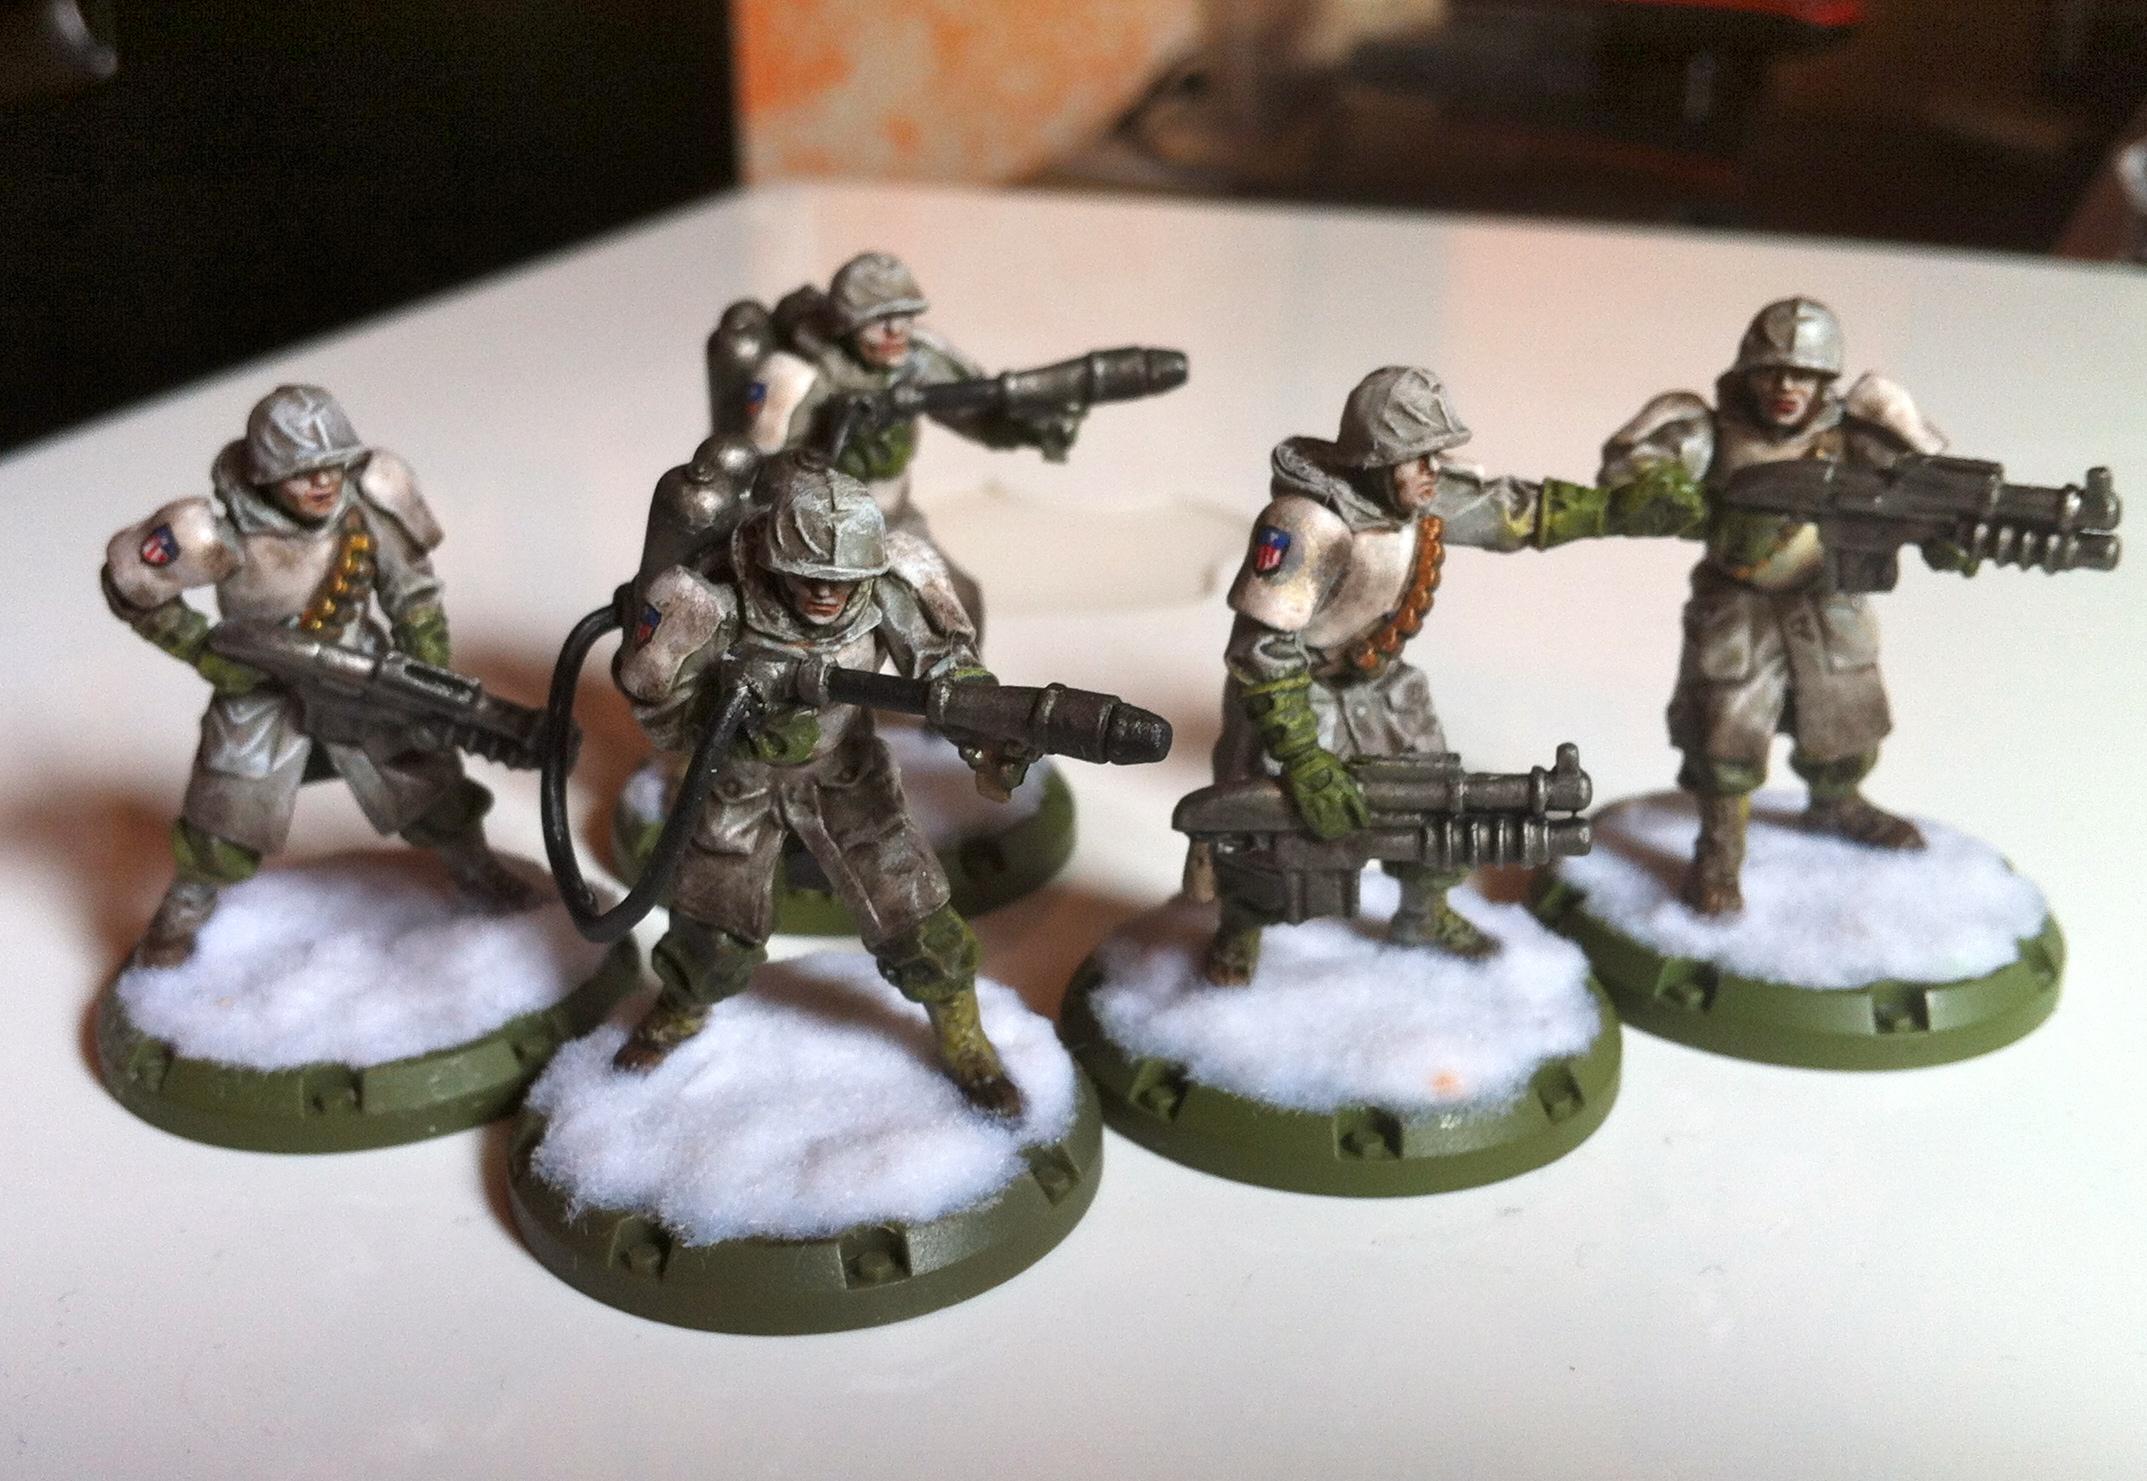 Allies, Dust Tactics, Hell Boys, Hero, Rangers